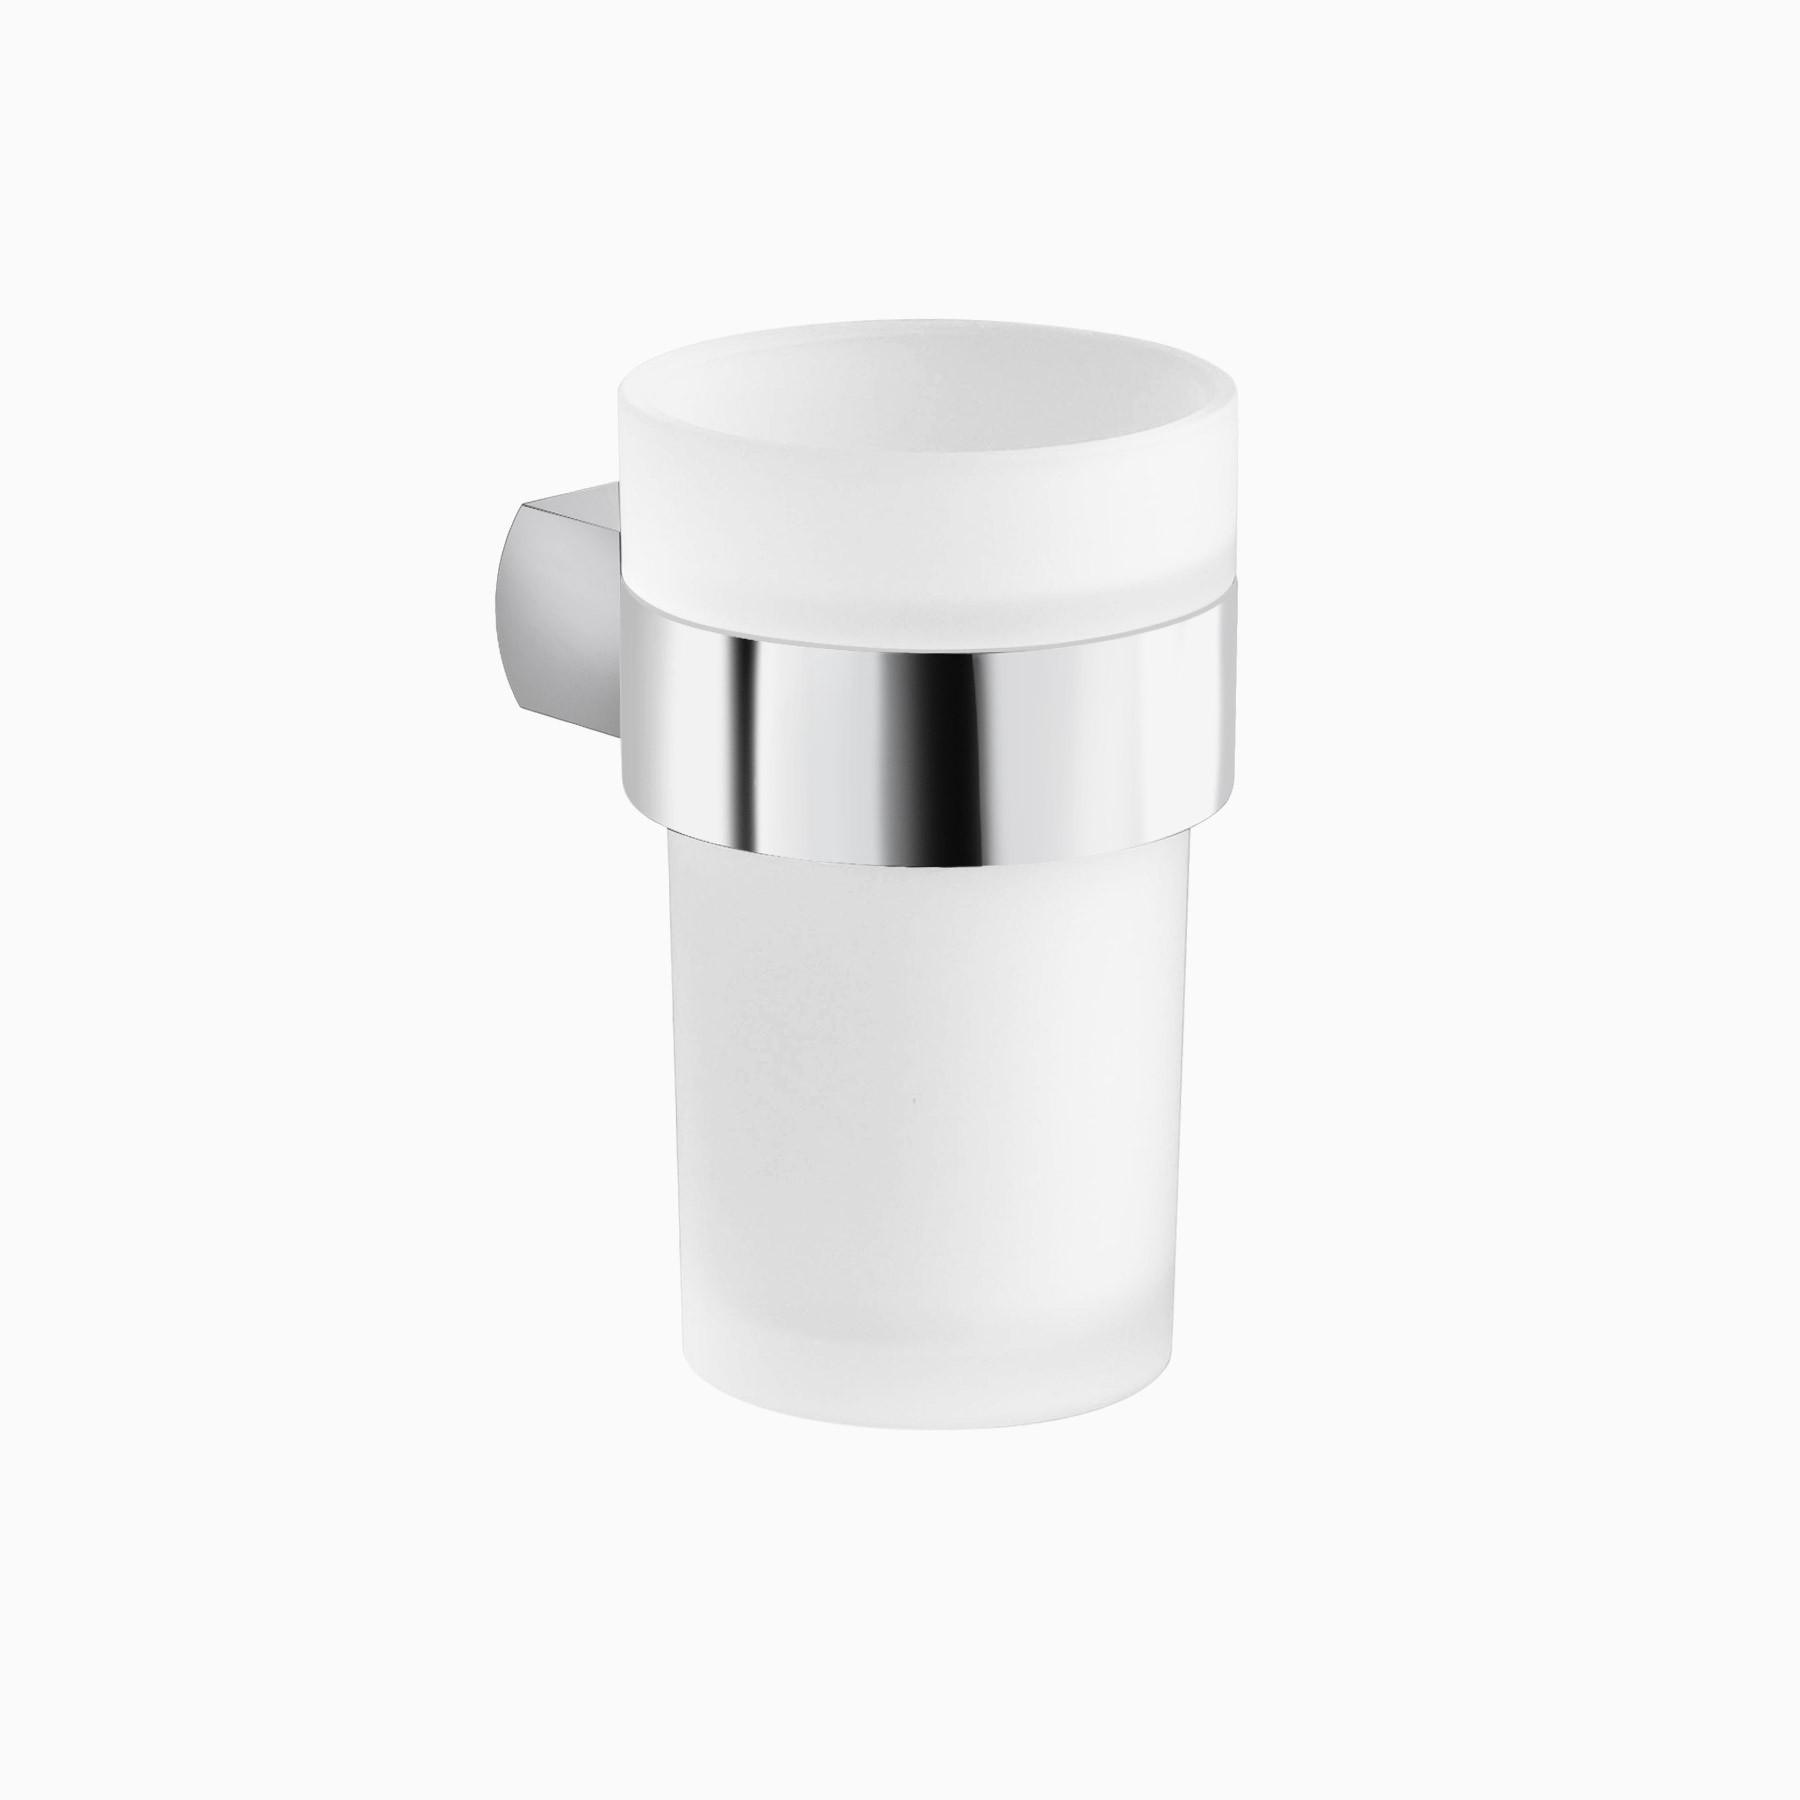 noe valley wall mounted bathroom tumbler holder polished chrome - Bathroom Tumbler